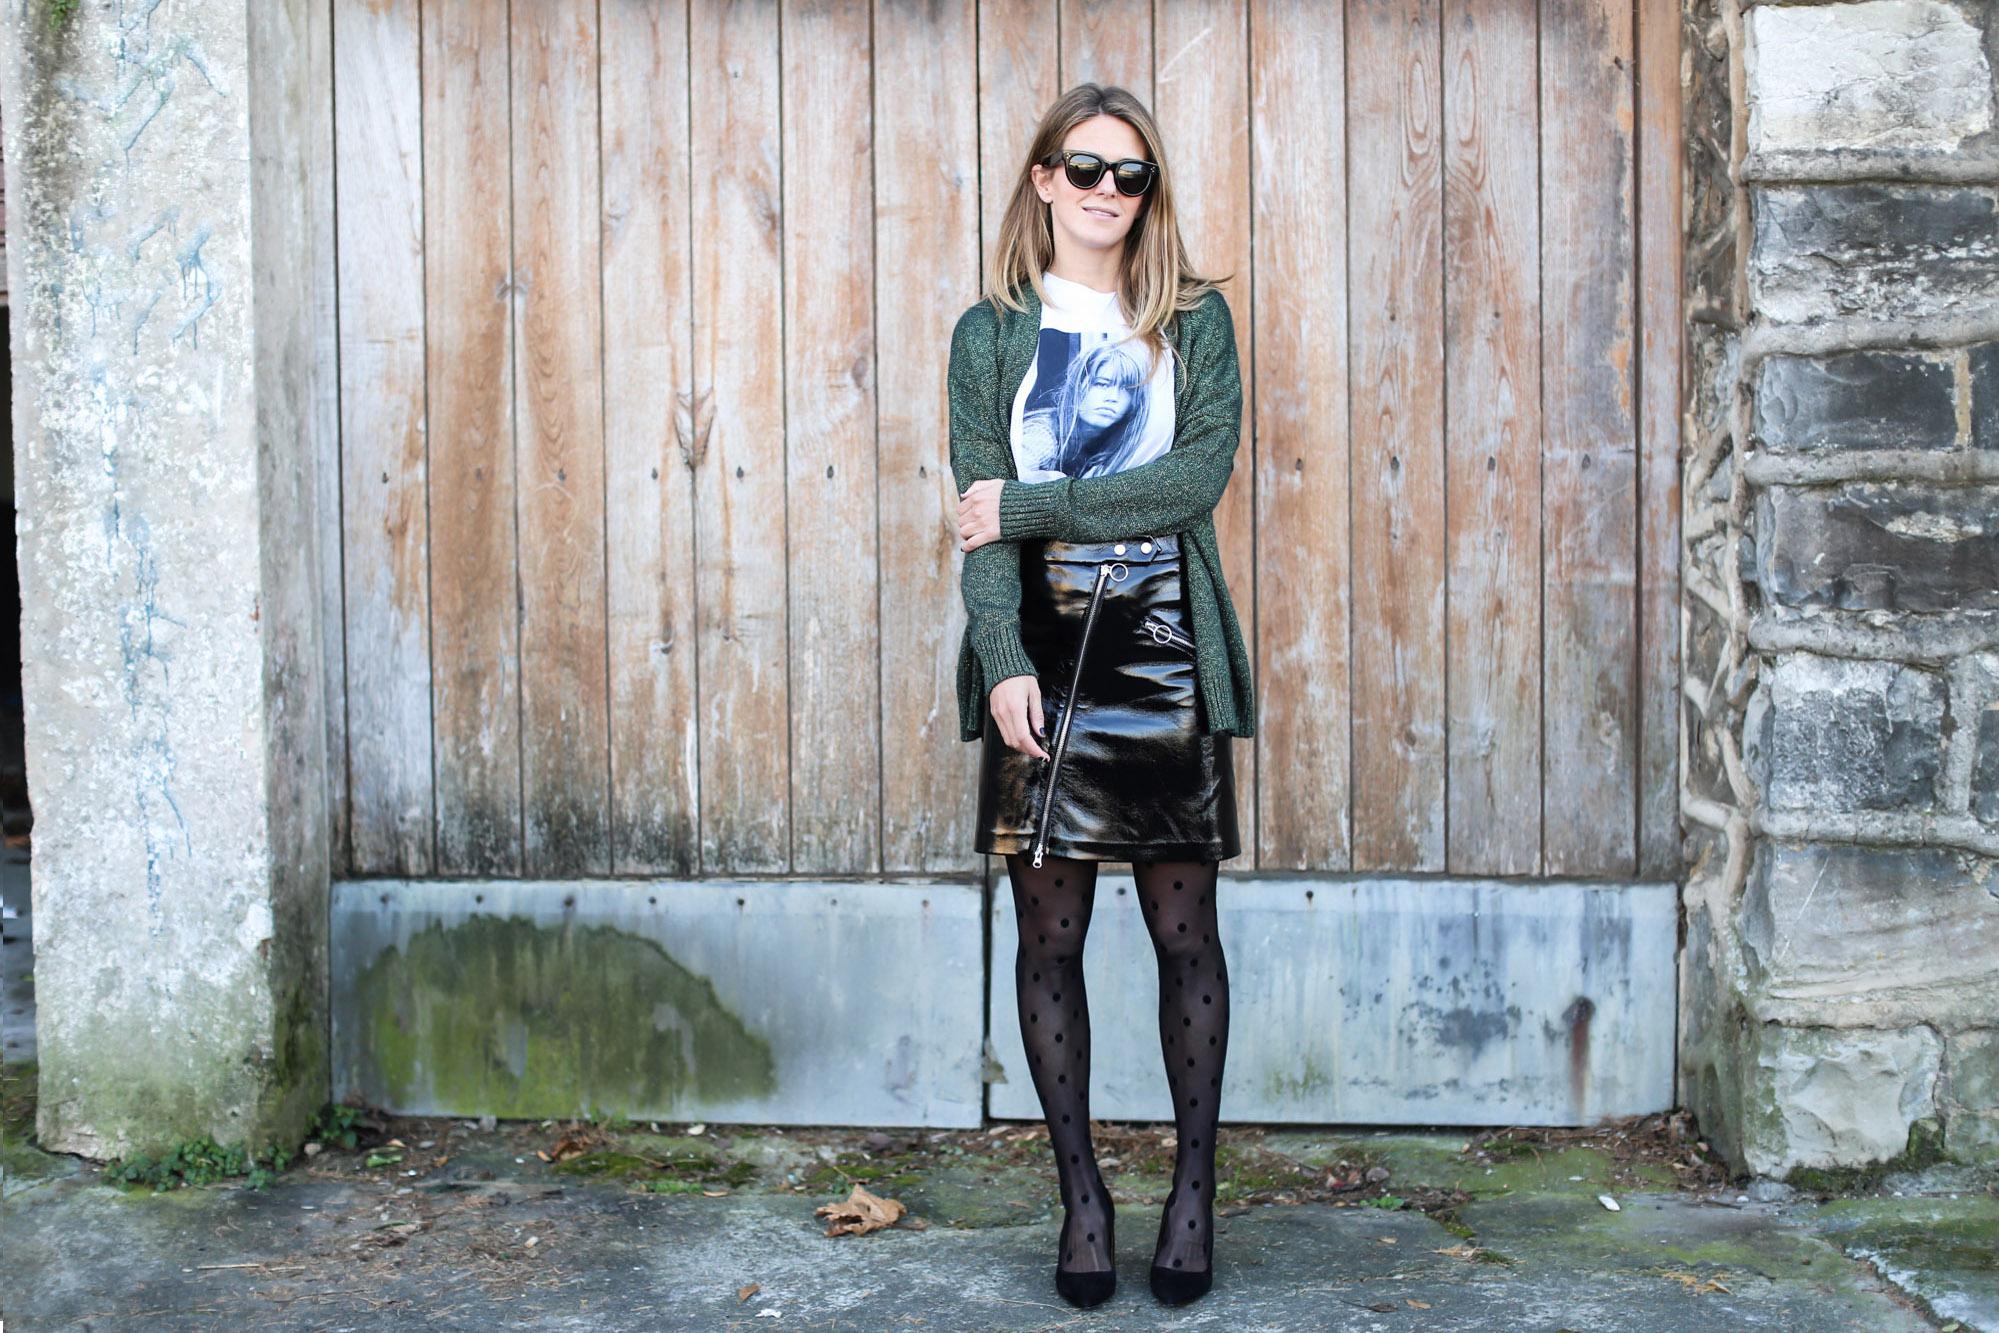 clochet_streetstyle_fashionblogger_minifaldarockeracharolzara_camiserahardypromod_abrigolargolanacos-3